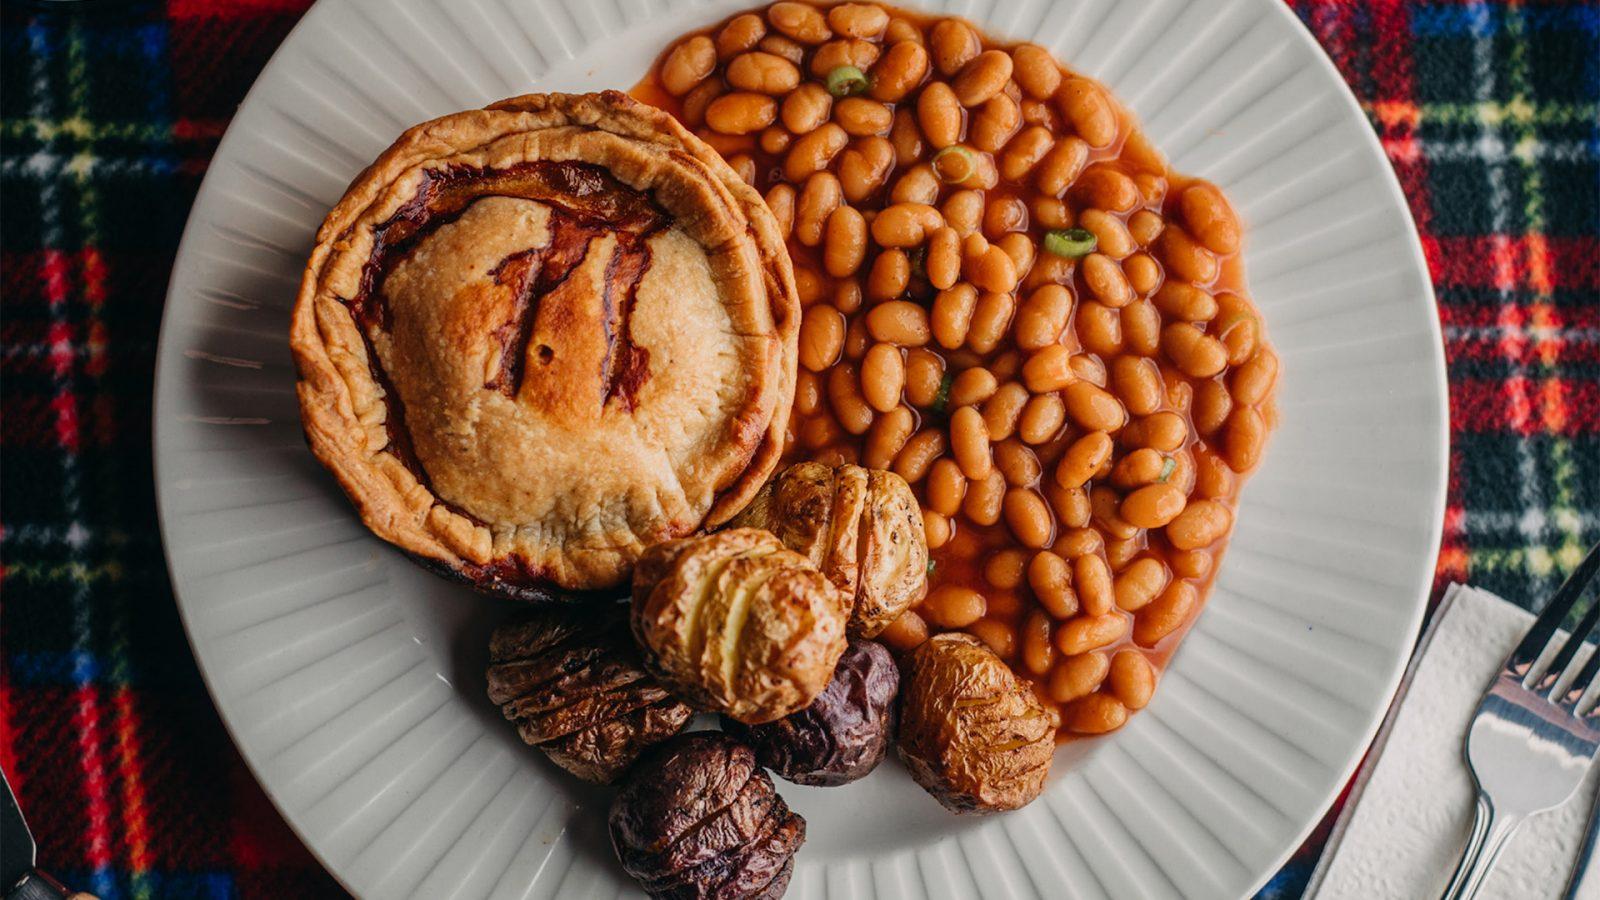 Riverdale Orchard Scotch Pies